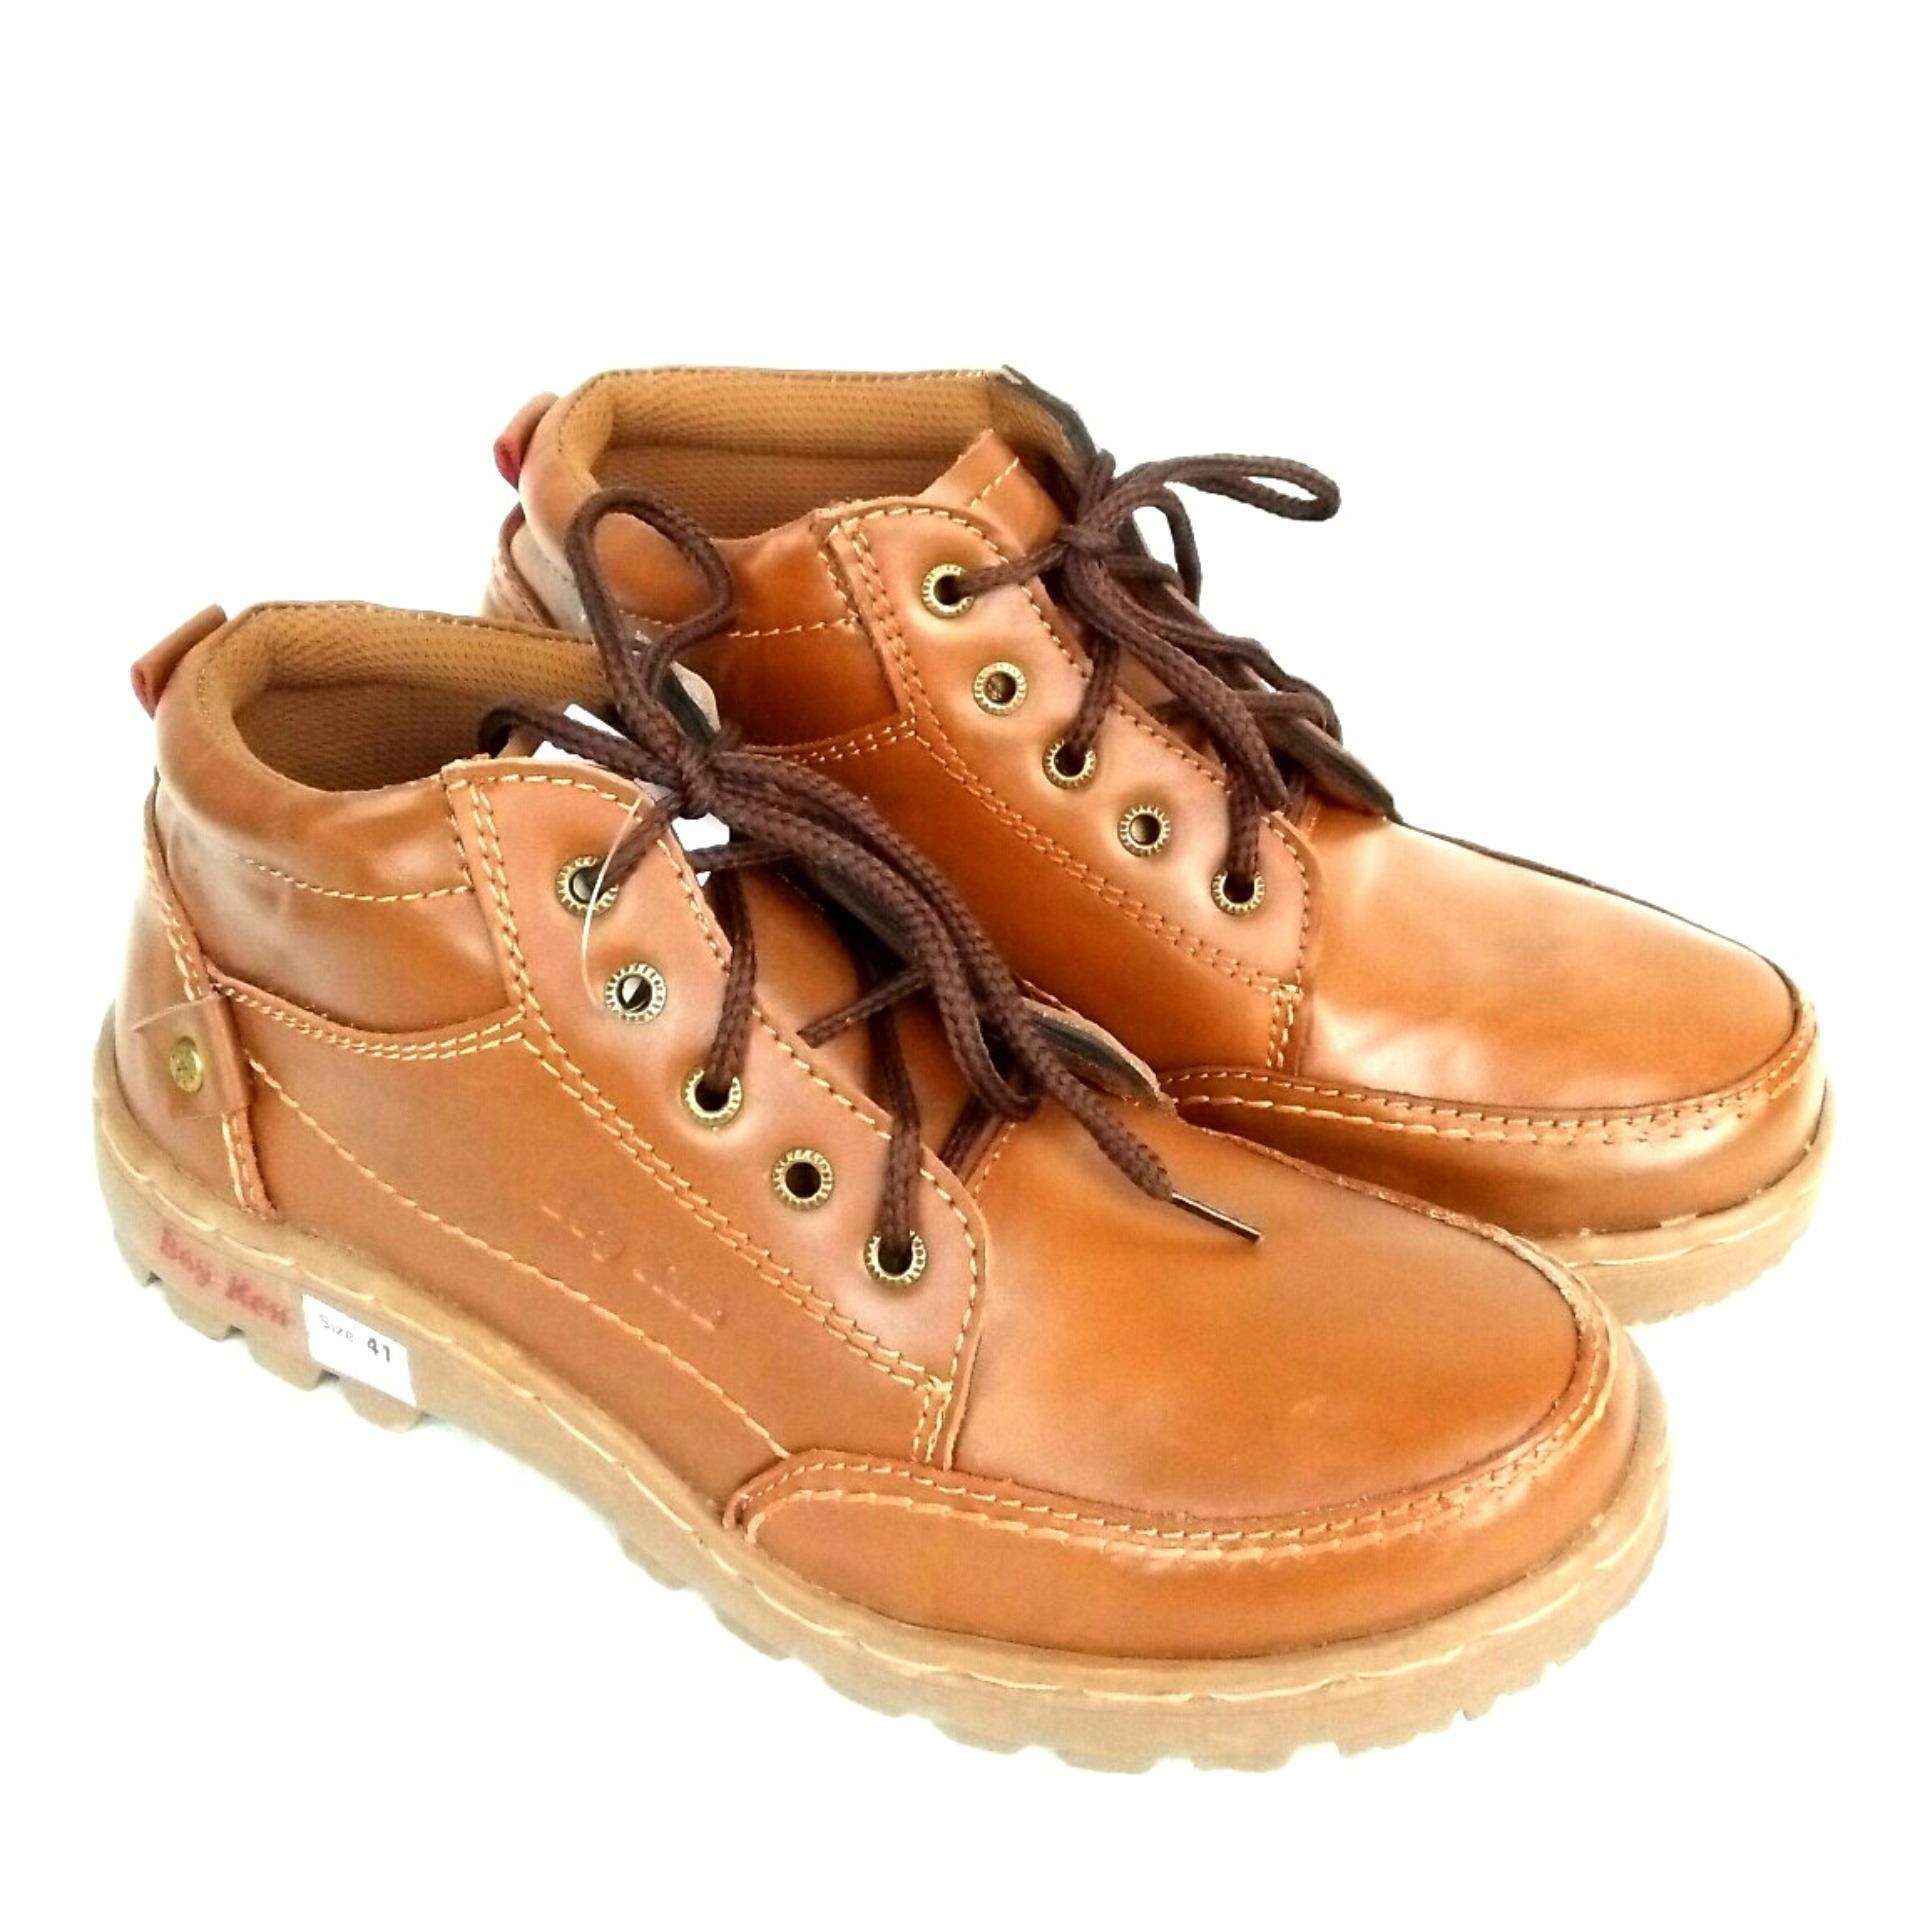 Review Toko Man Dien Sepatu Cassual Kulit Asli Semi Boots Zipper B Keen Ljk 8 Tan Online